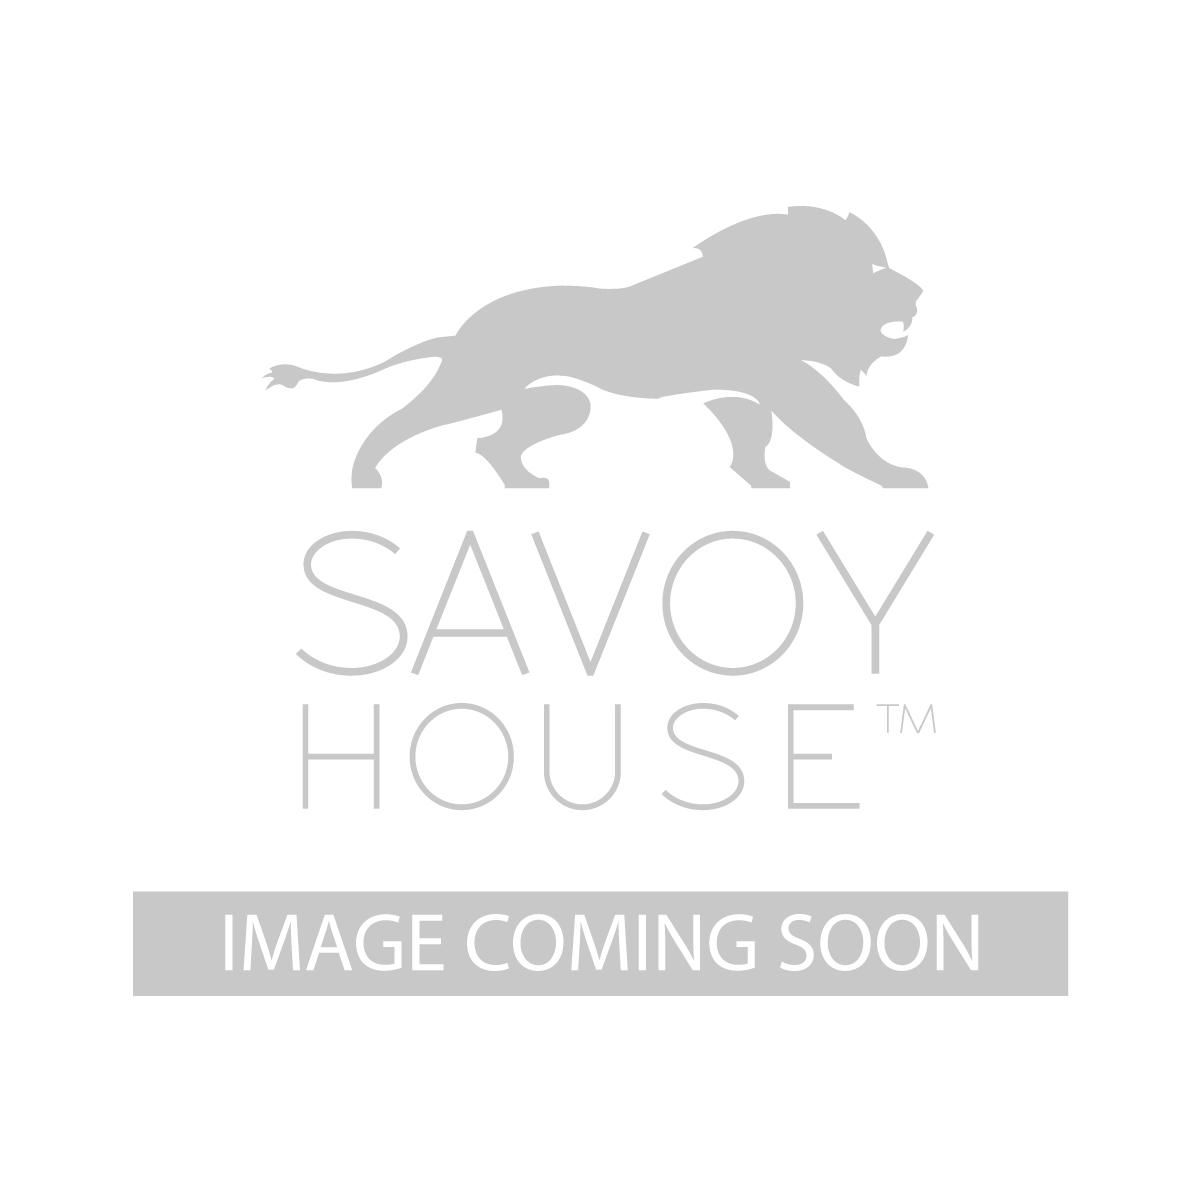 3 823 9 212 Berlin 9 Light Foyer By Savoy House